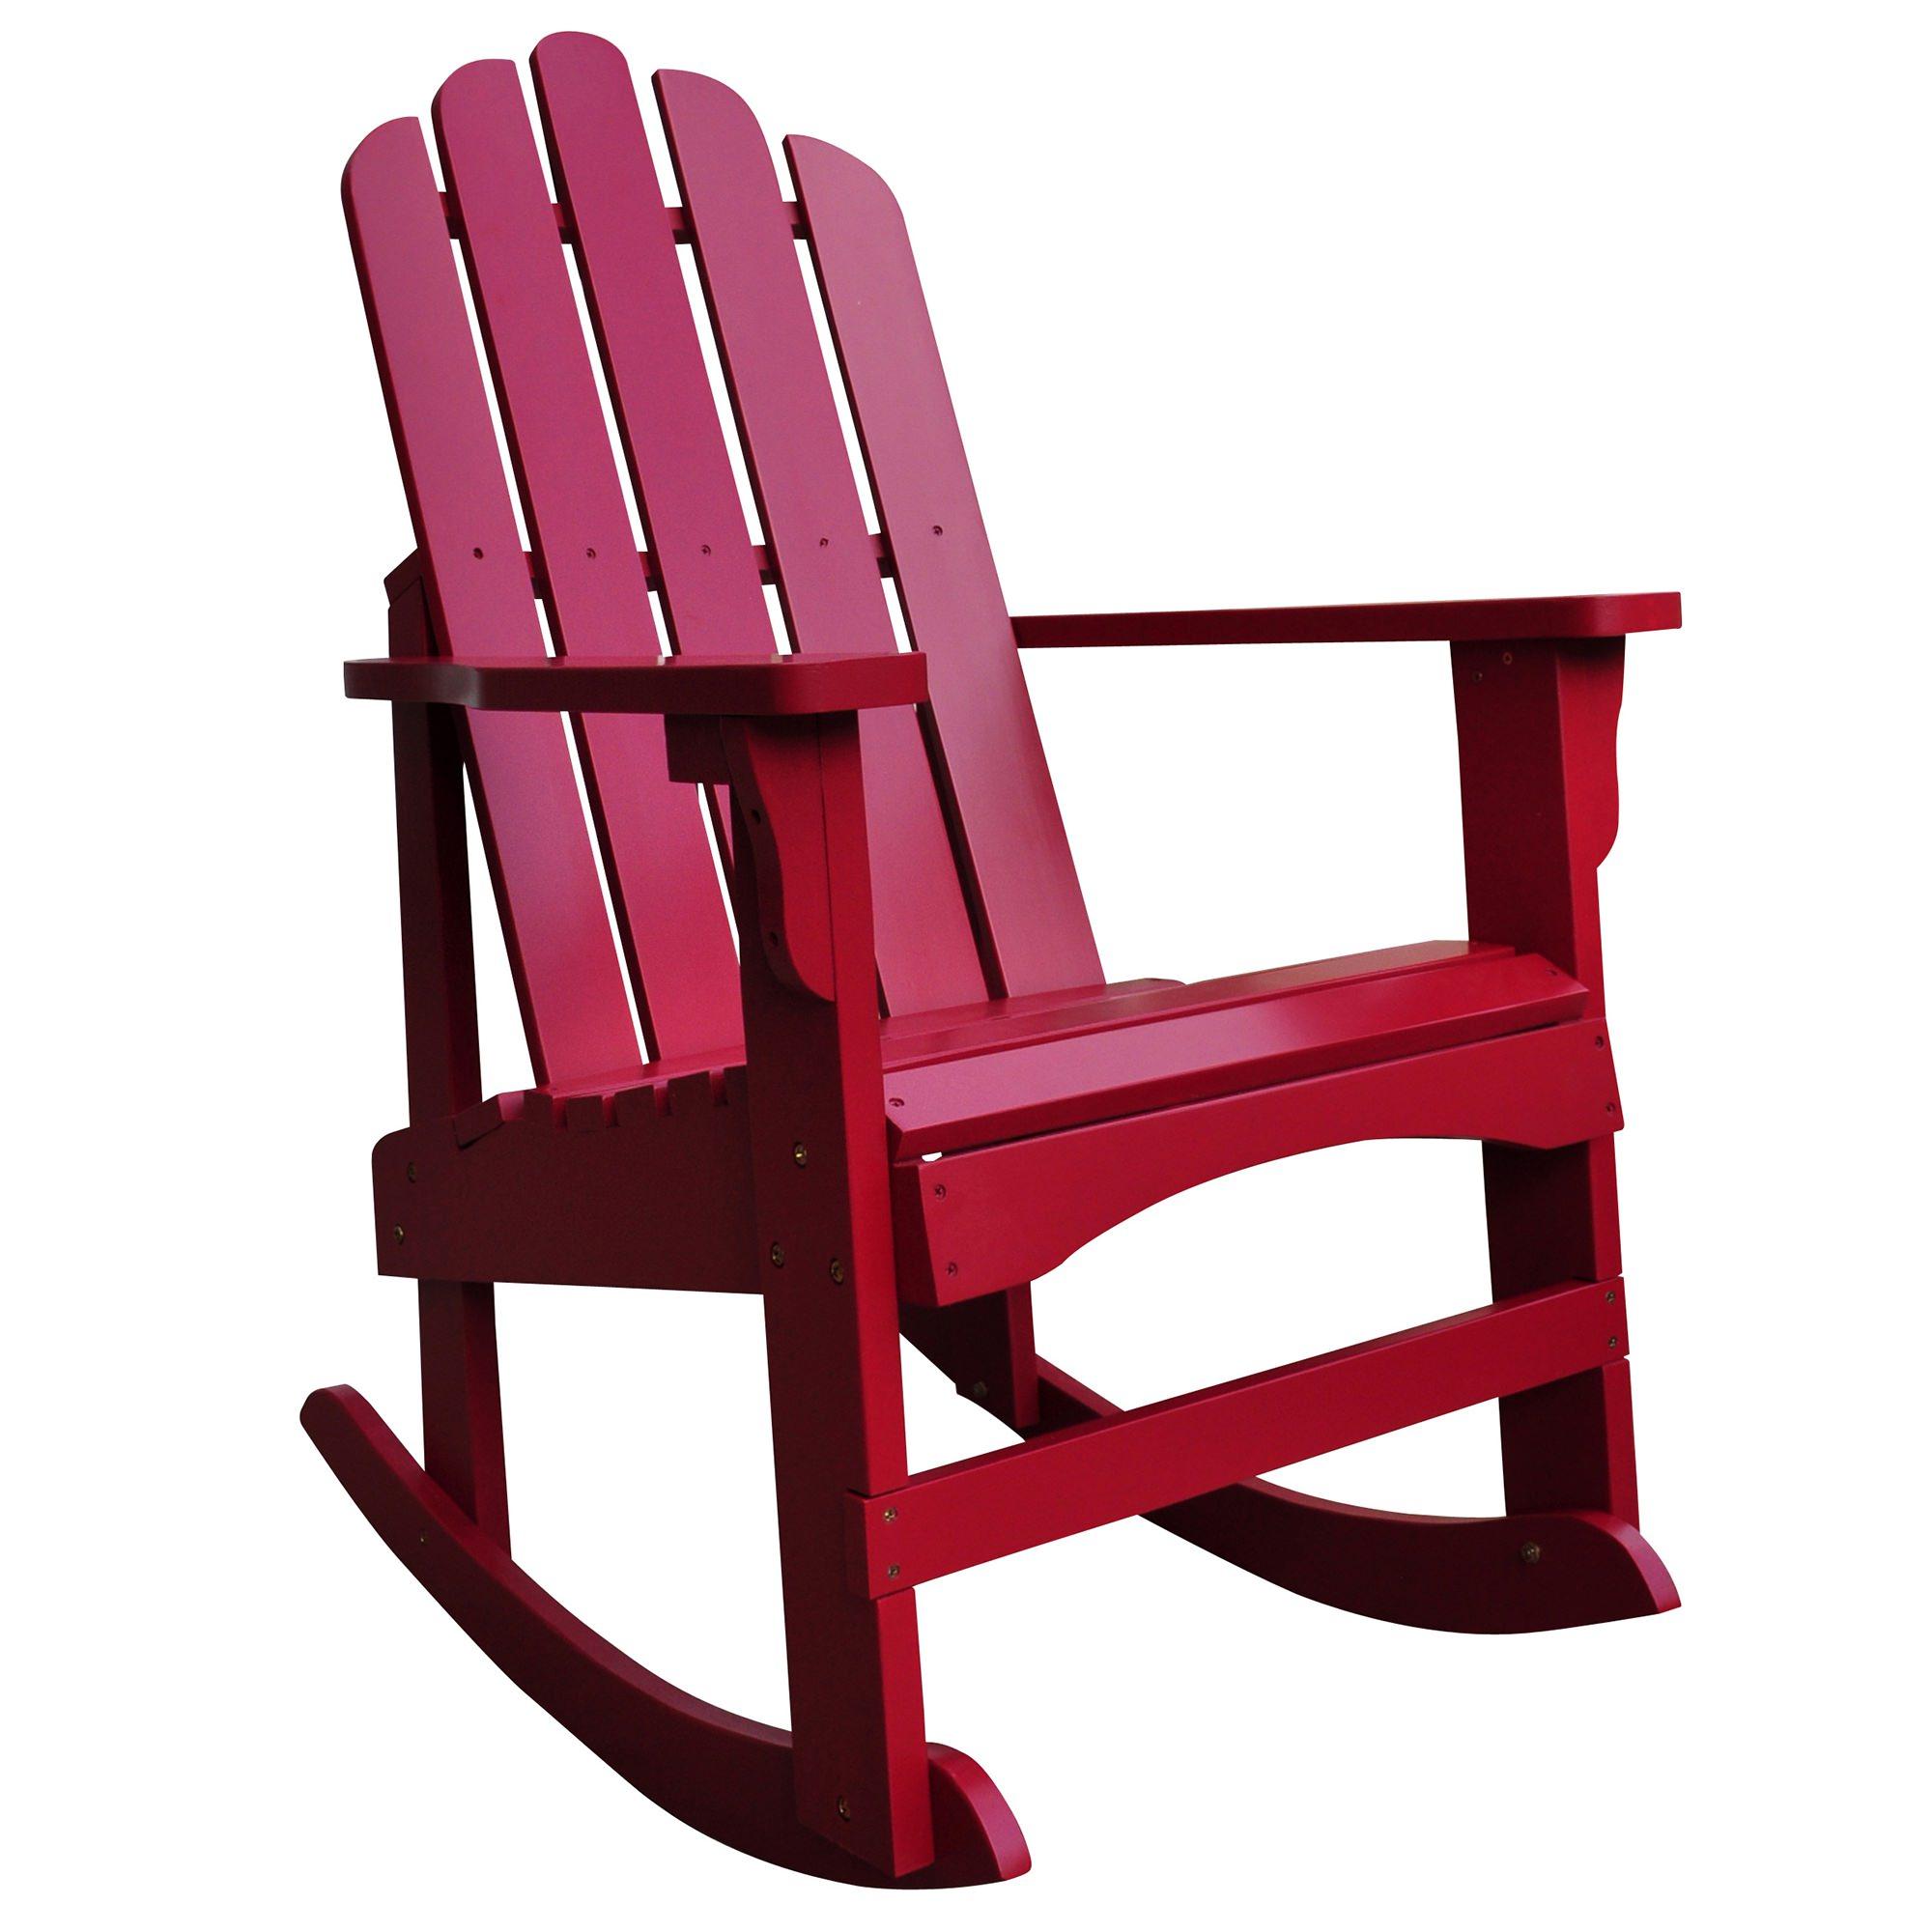 cedar rocking chairs office visitor marina porch rocker shine company dfohome